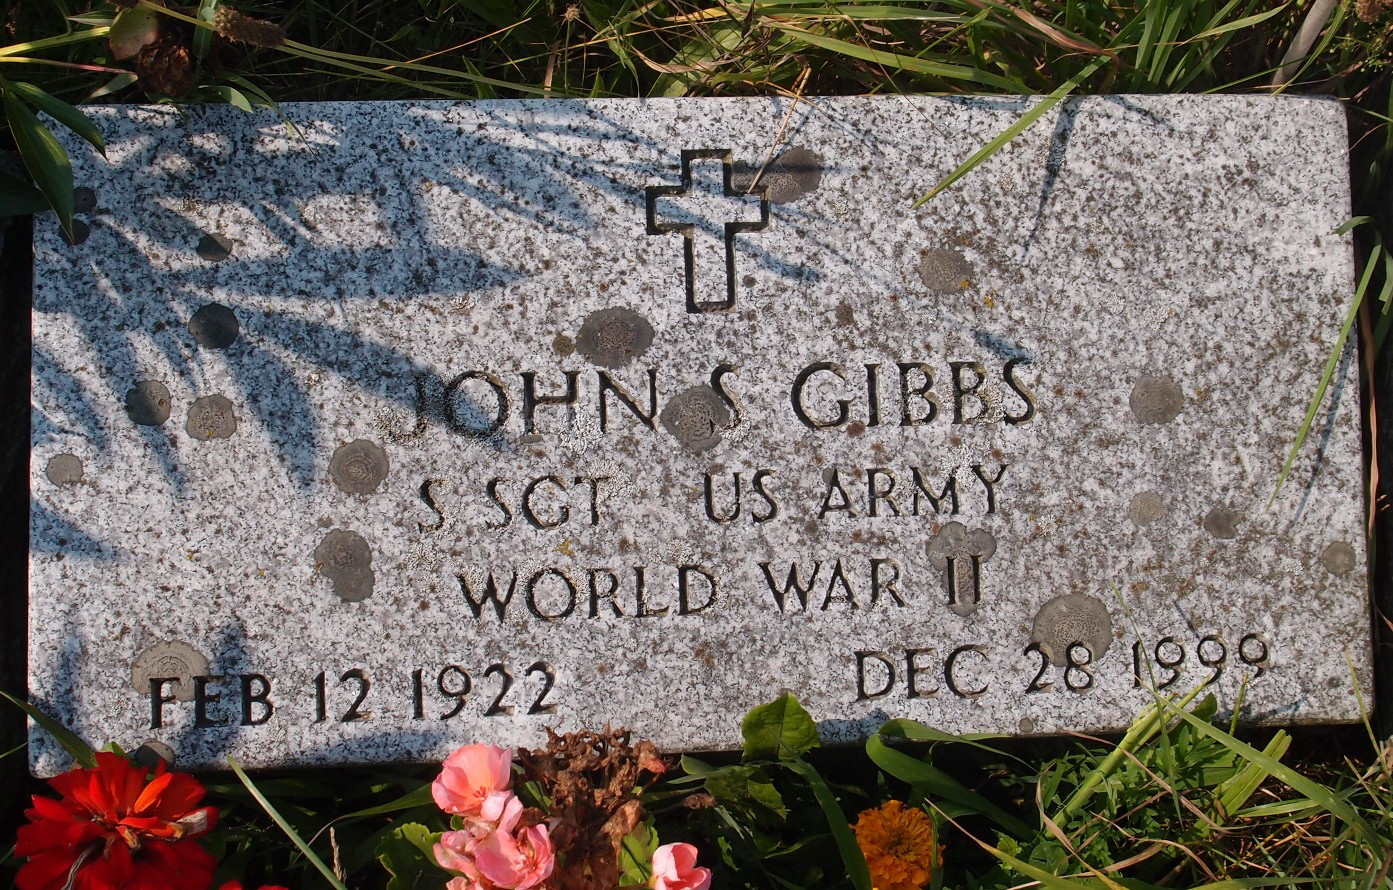 Shotgun Gibbs